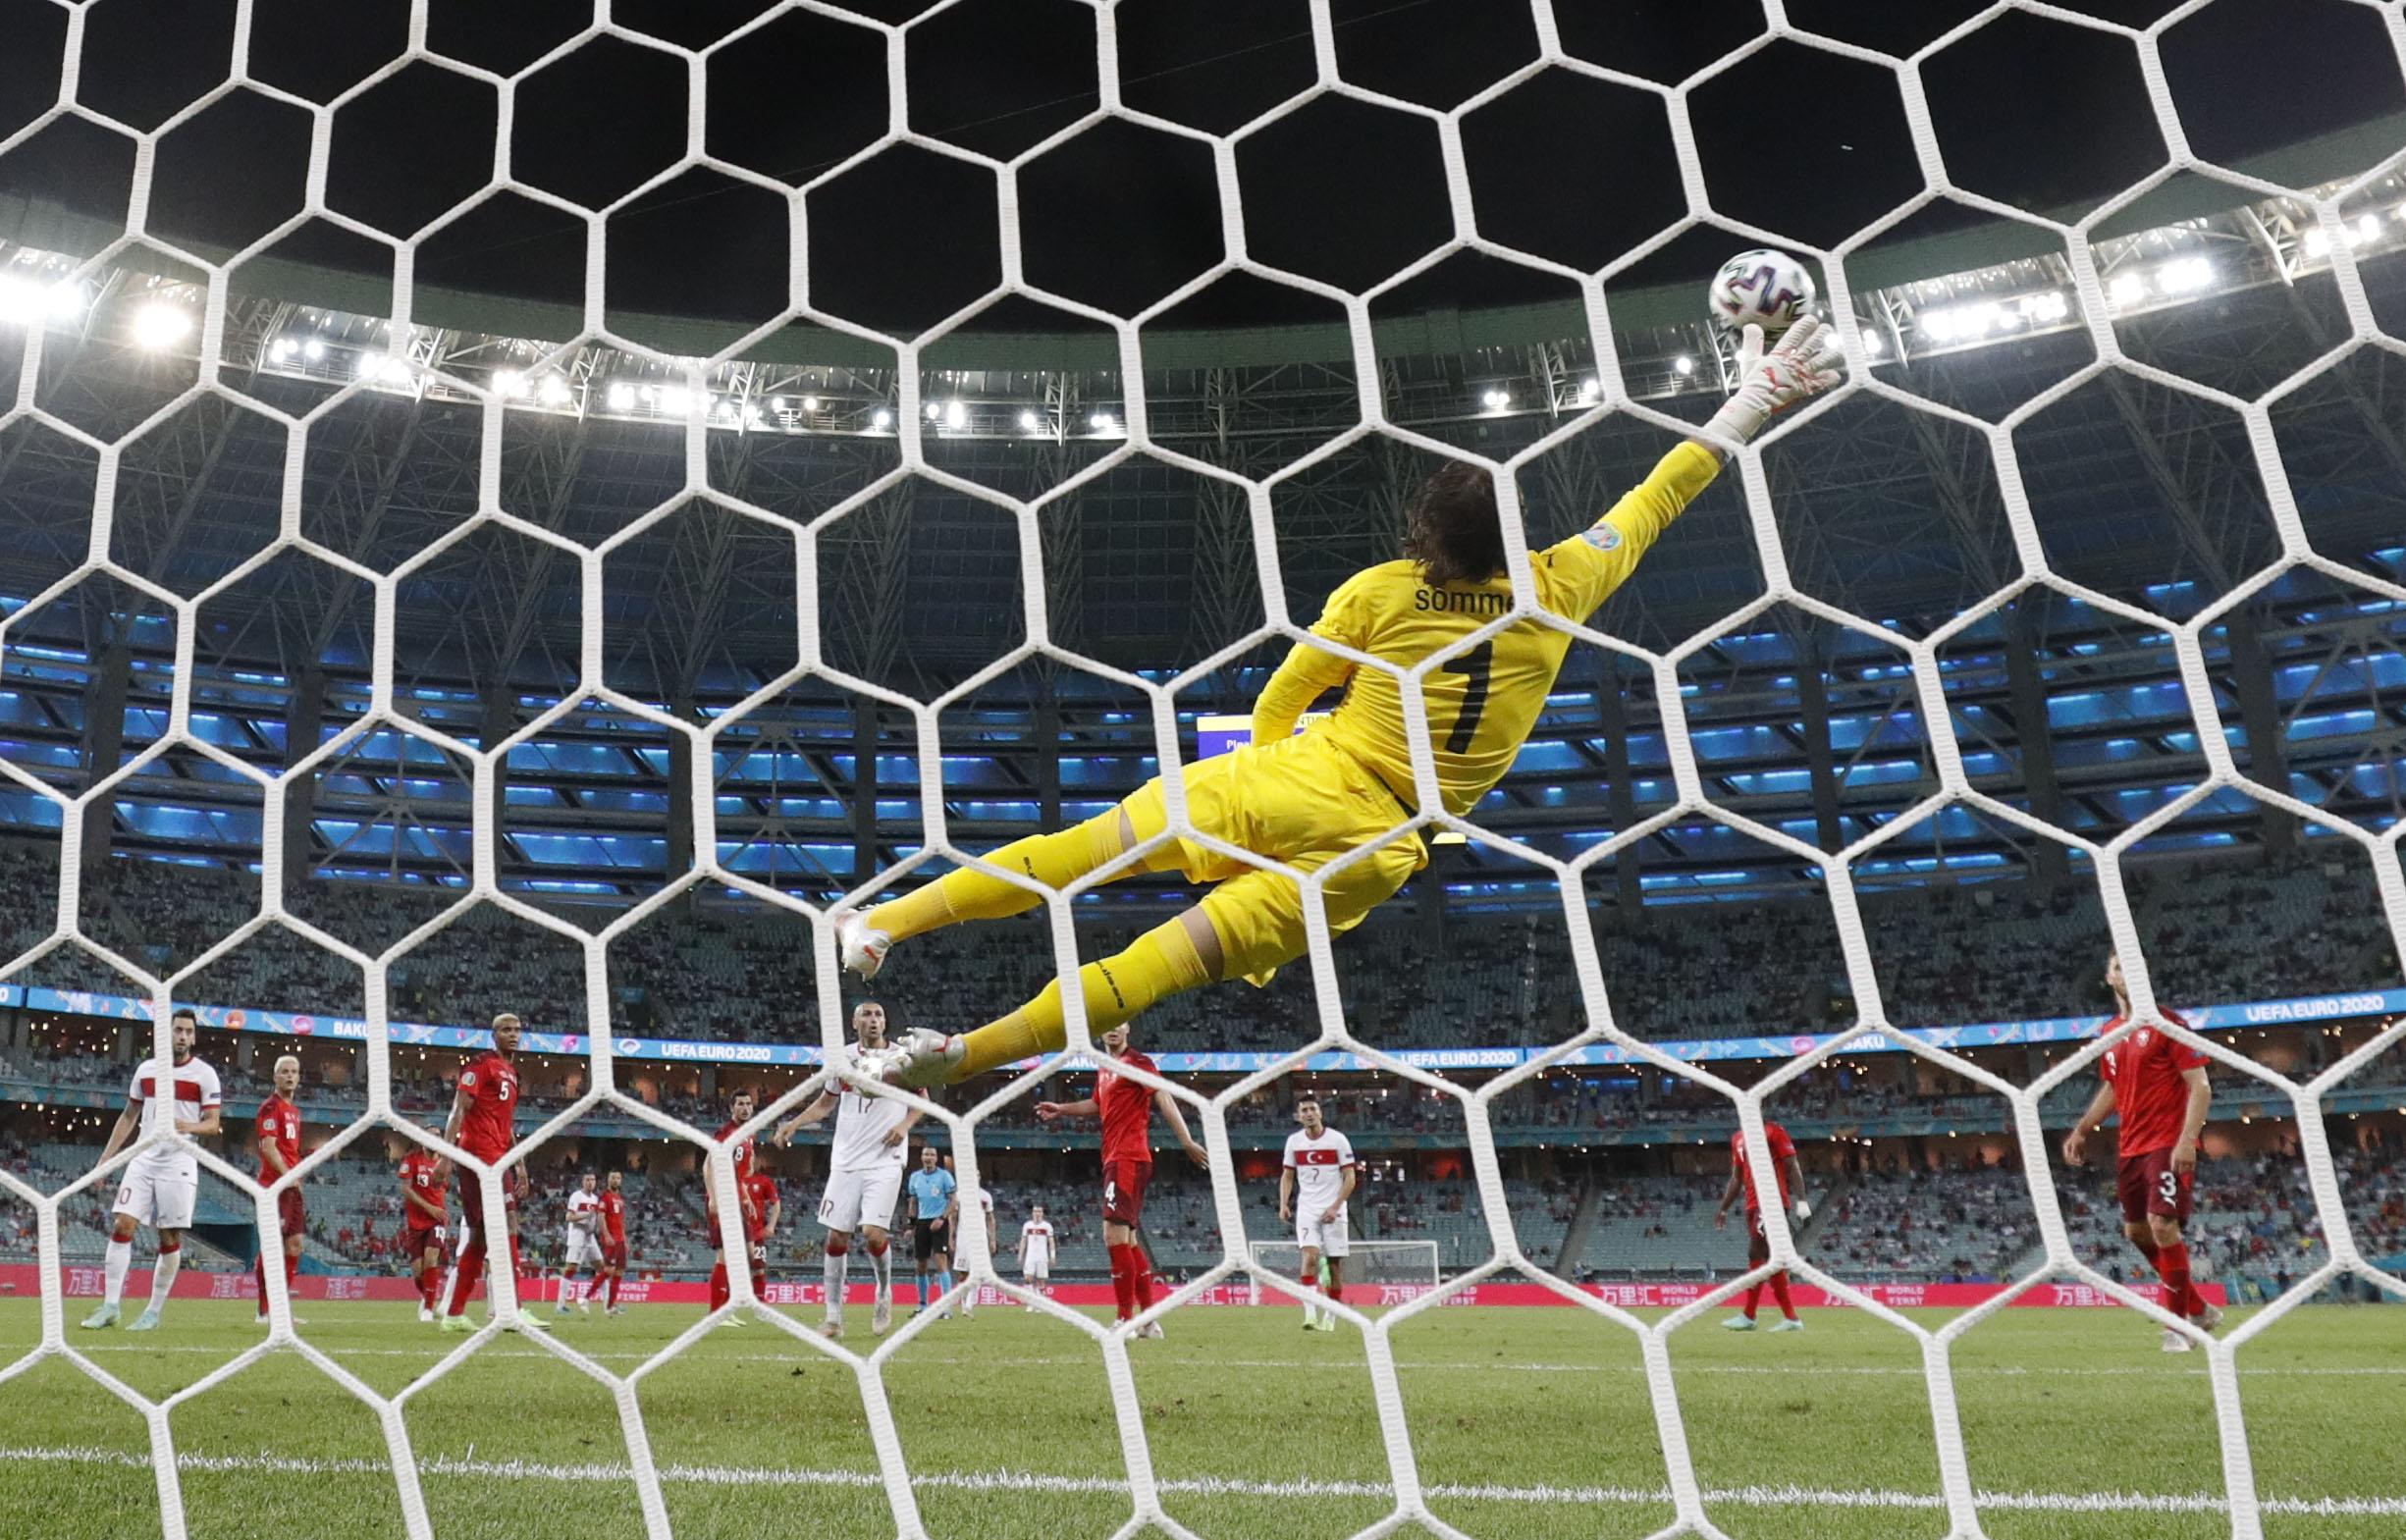 Soccer Football - Euro 2020 - Group A - Switzerland v Turkey - Baku Olympic Stadium, Baku, Azerbaijan - June 20, 2021 Turkey's Irfan Kahveci scores their first goal REUTERS/Valentyn Ogirenko